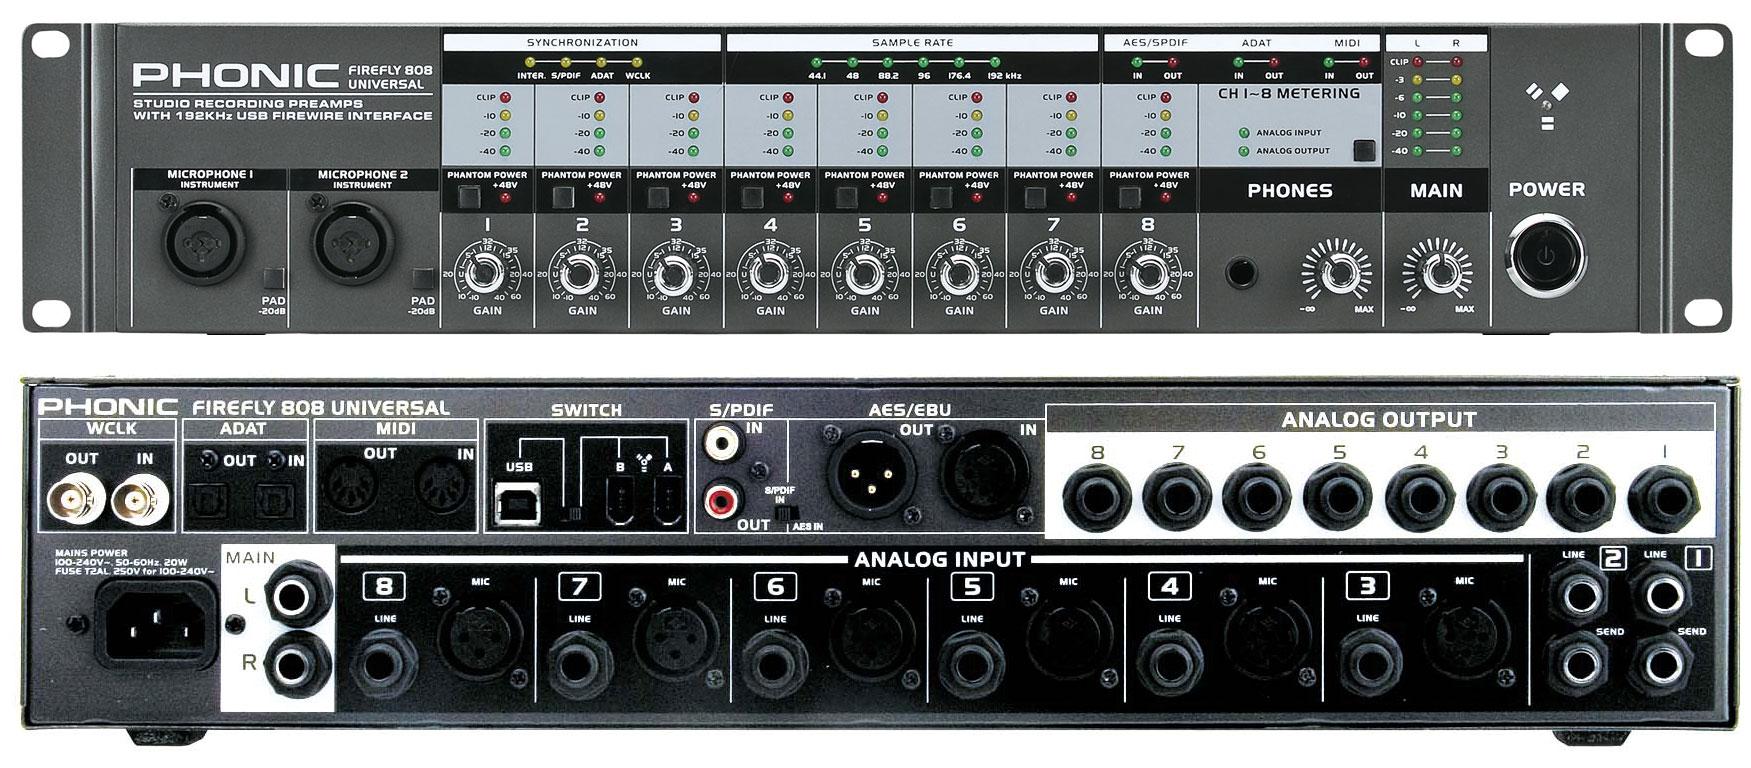 phonic firefly 808 u phonic firefly 808 u 24bit 192khz firewire audio interface with 8x. Black Bedroom Furniture Sets. Home Design Ideas